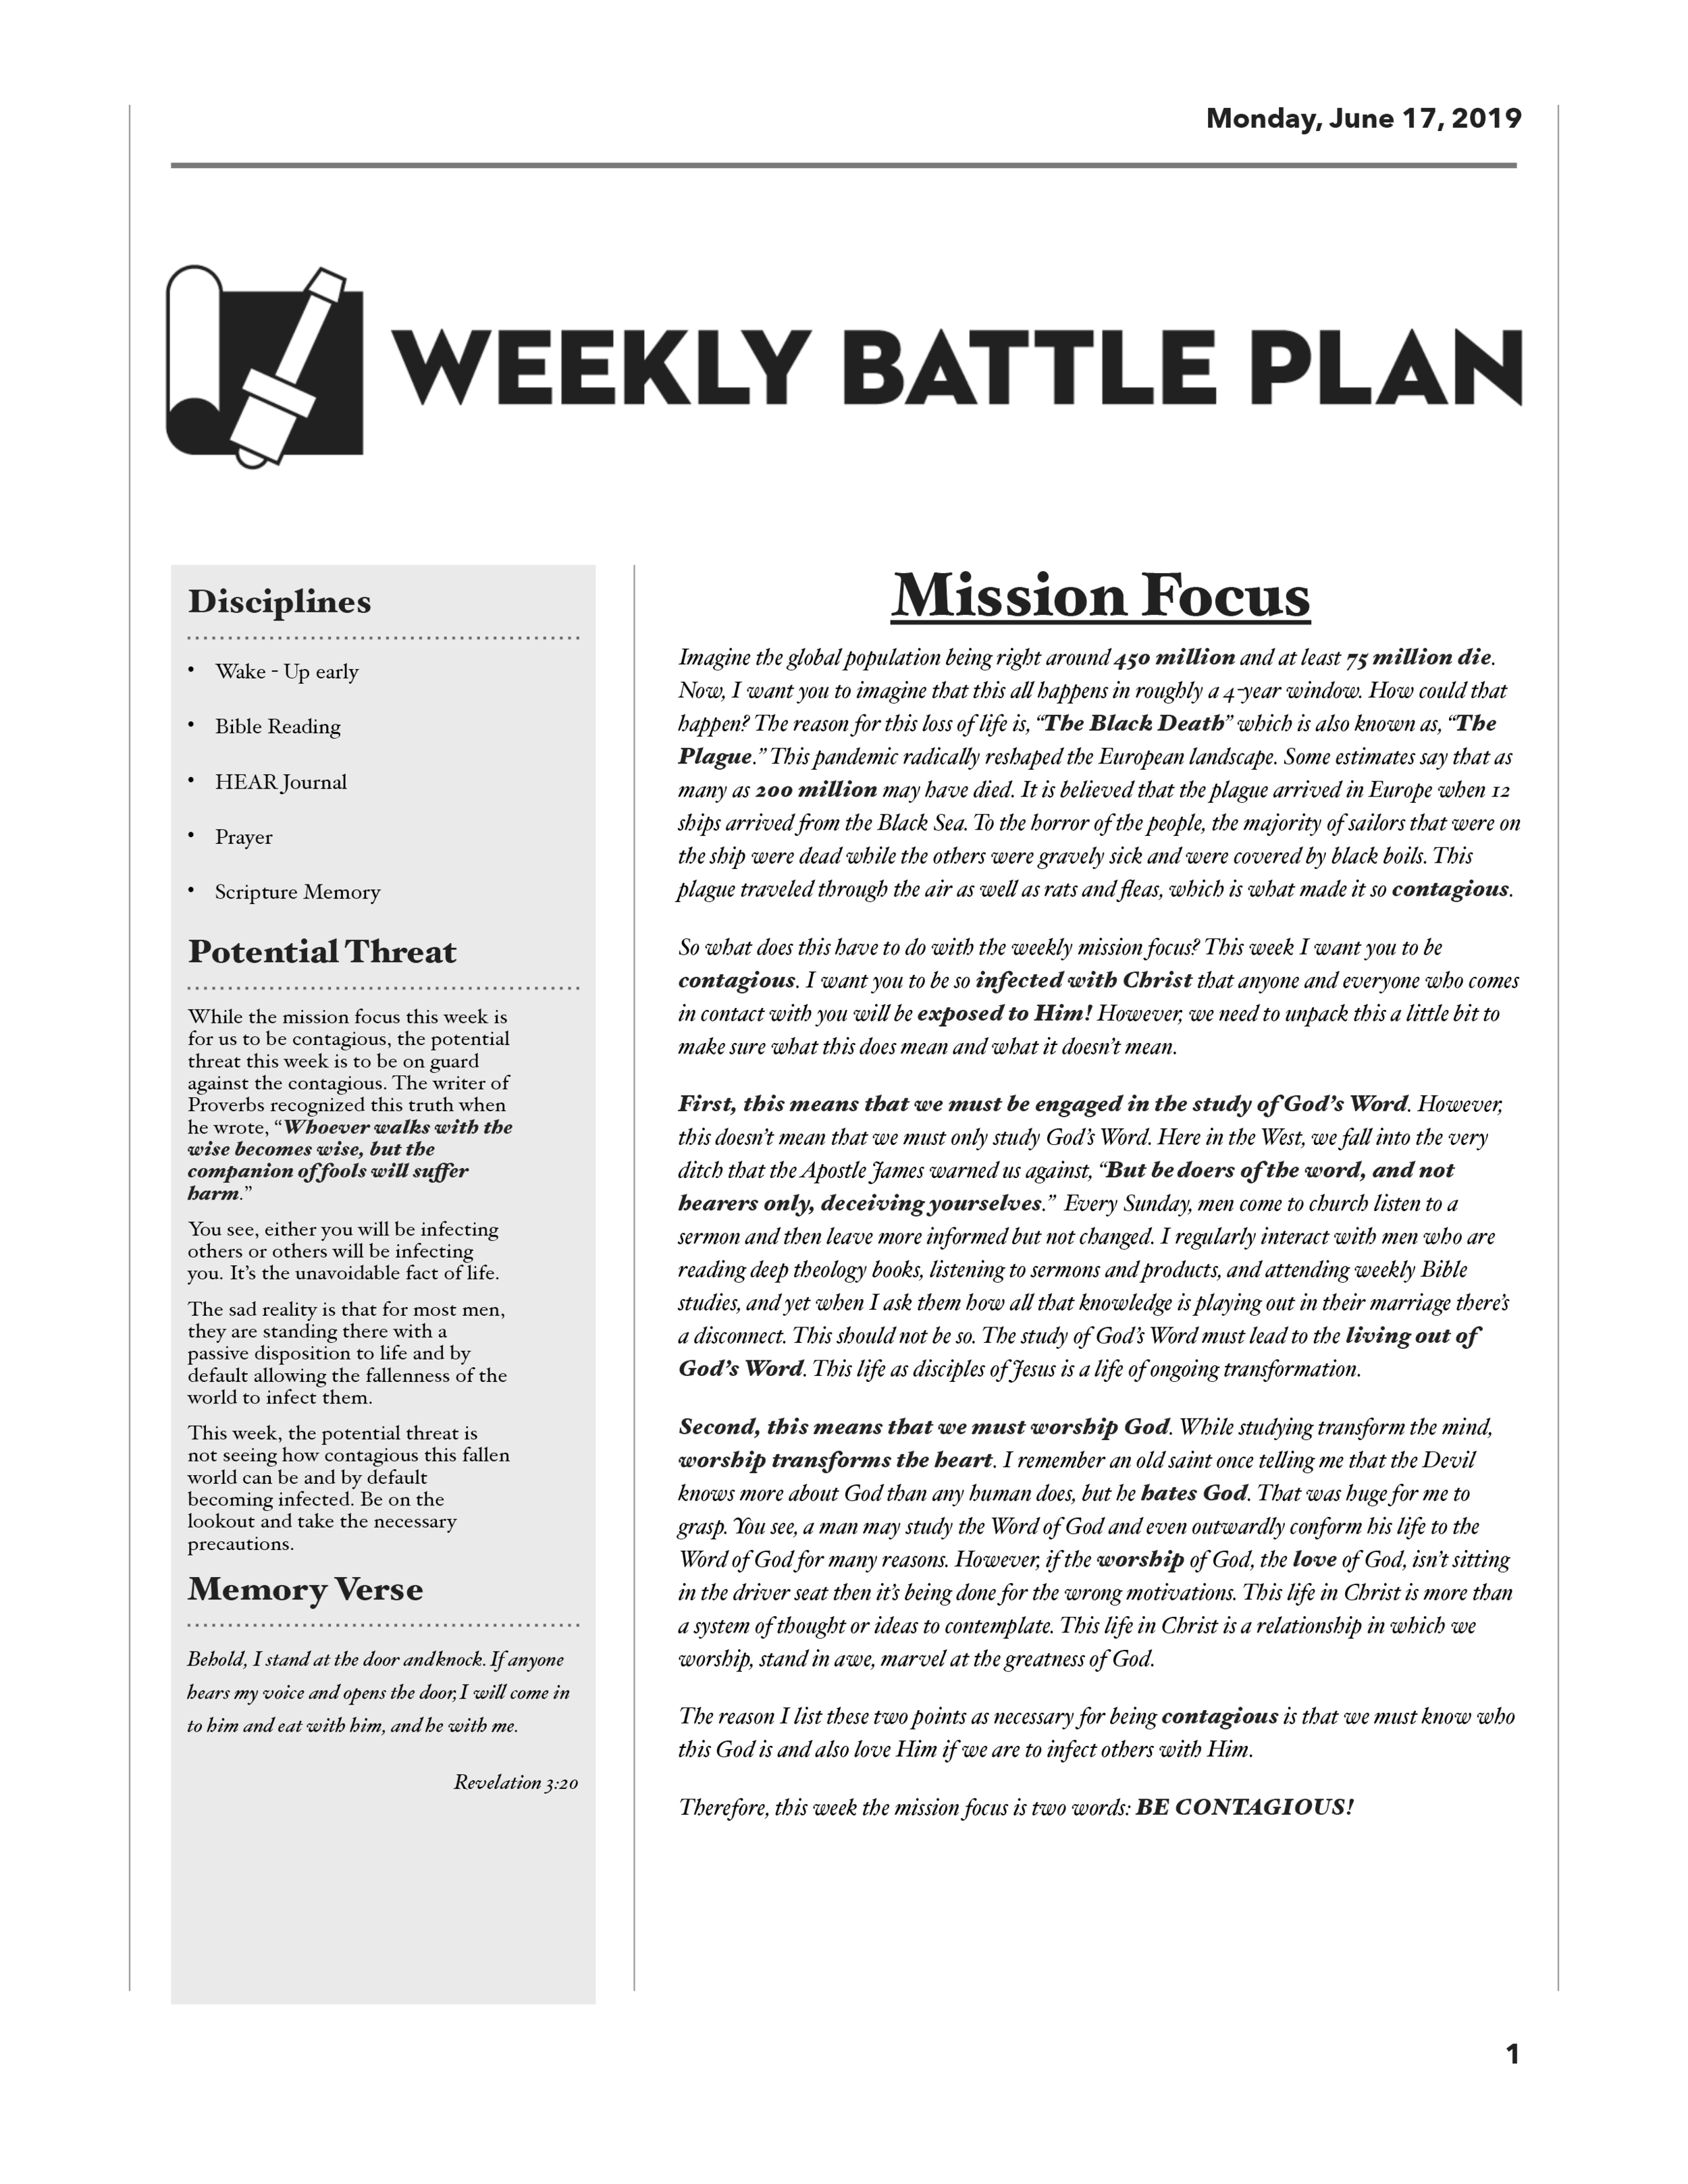 Battle Plan 6.17.19-1.png